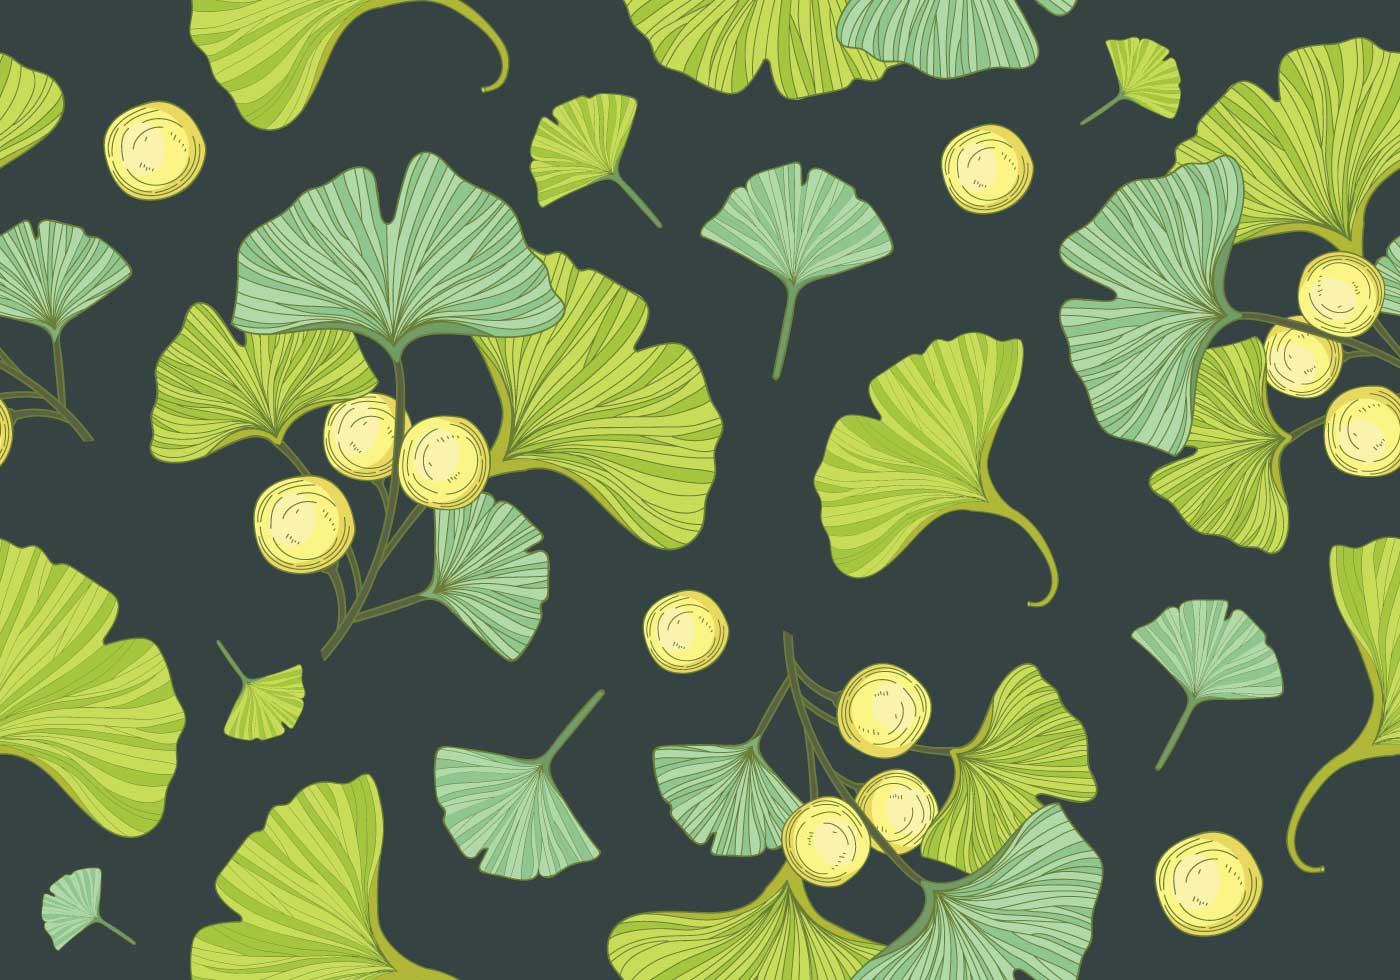 ginkgo biloba seamless pattern download free vector art